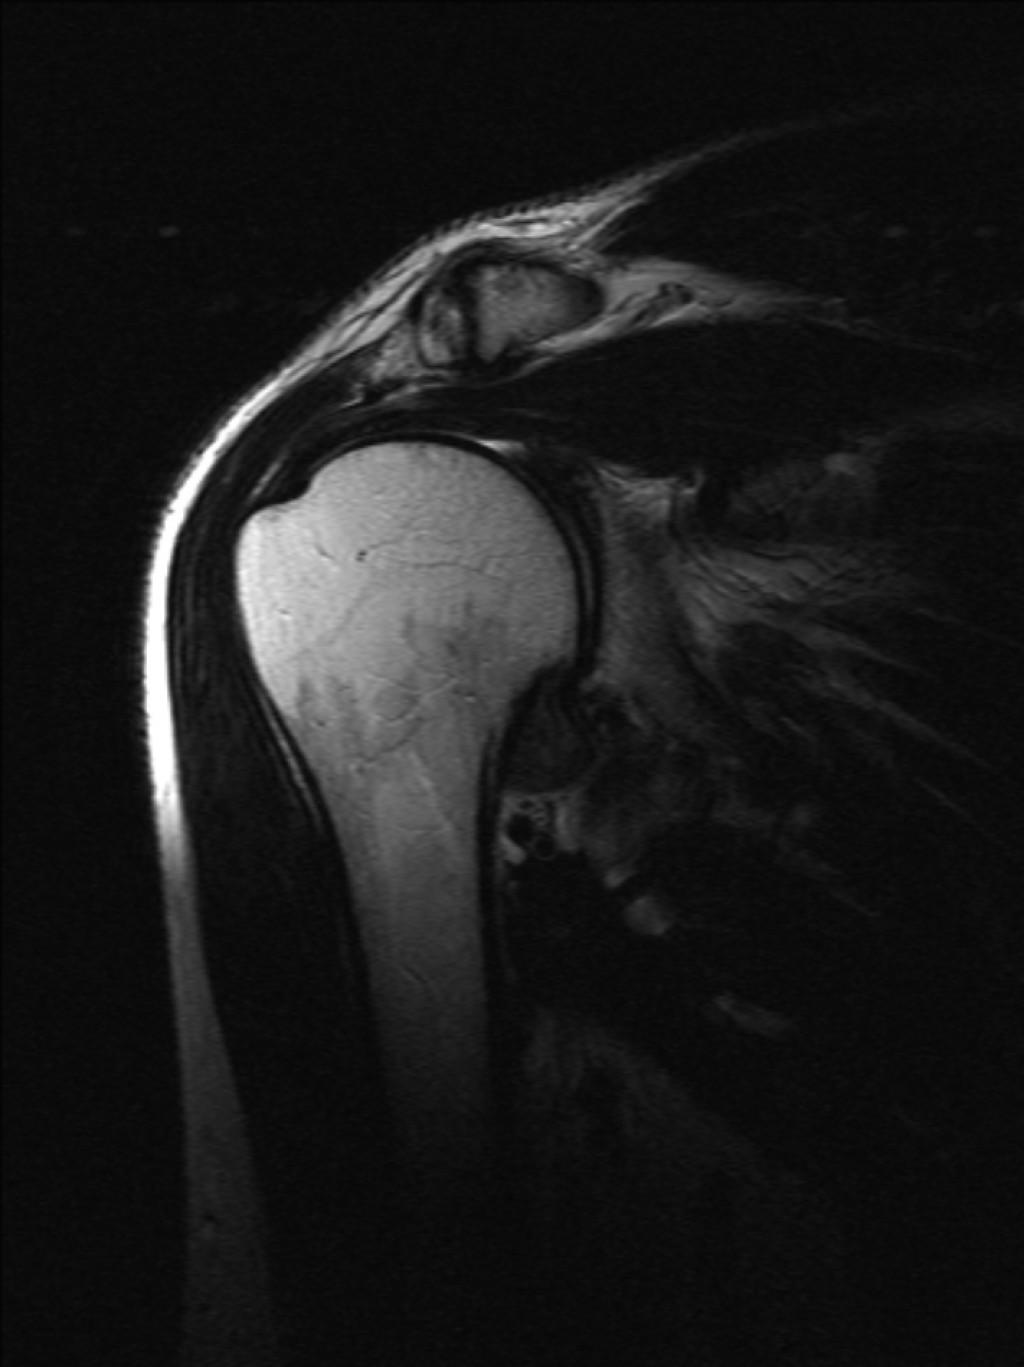 Адгезивный капсулит плечевого сустава (Adhesive capsulitis of the shoulder)